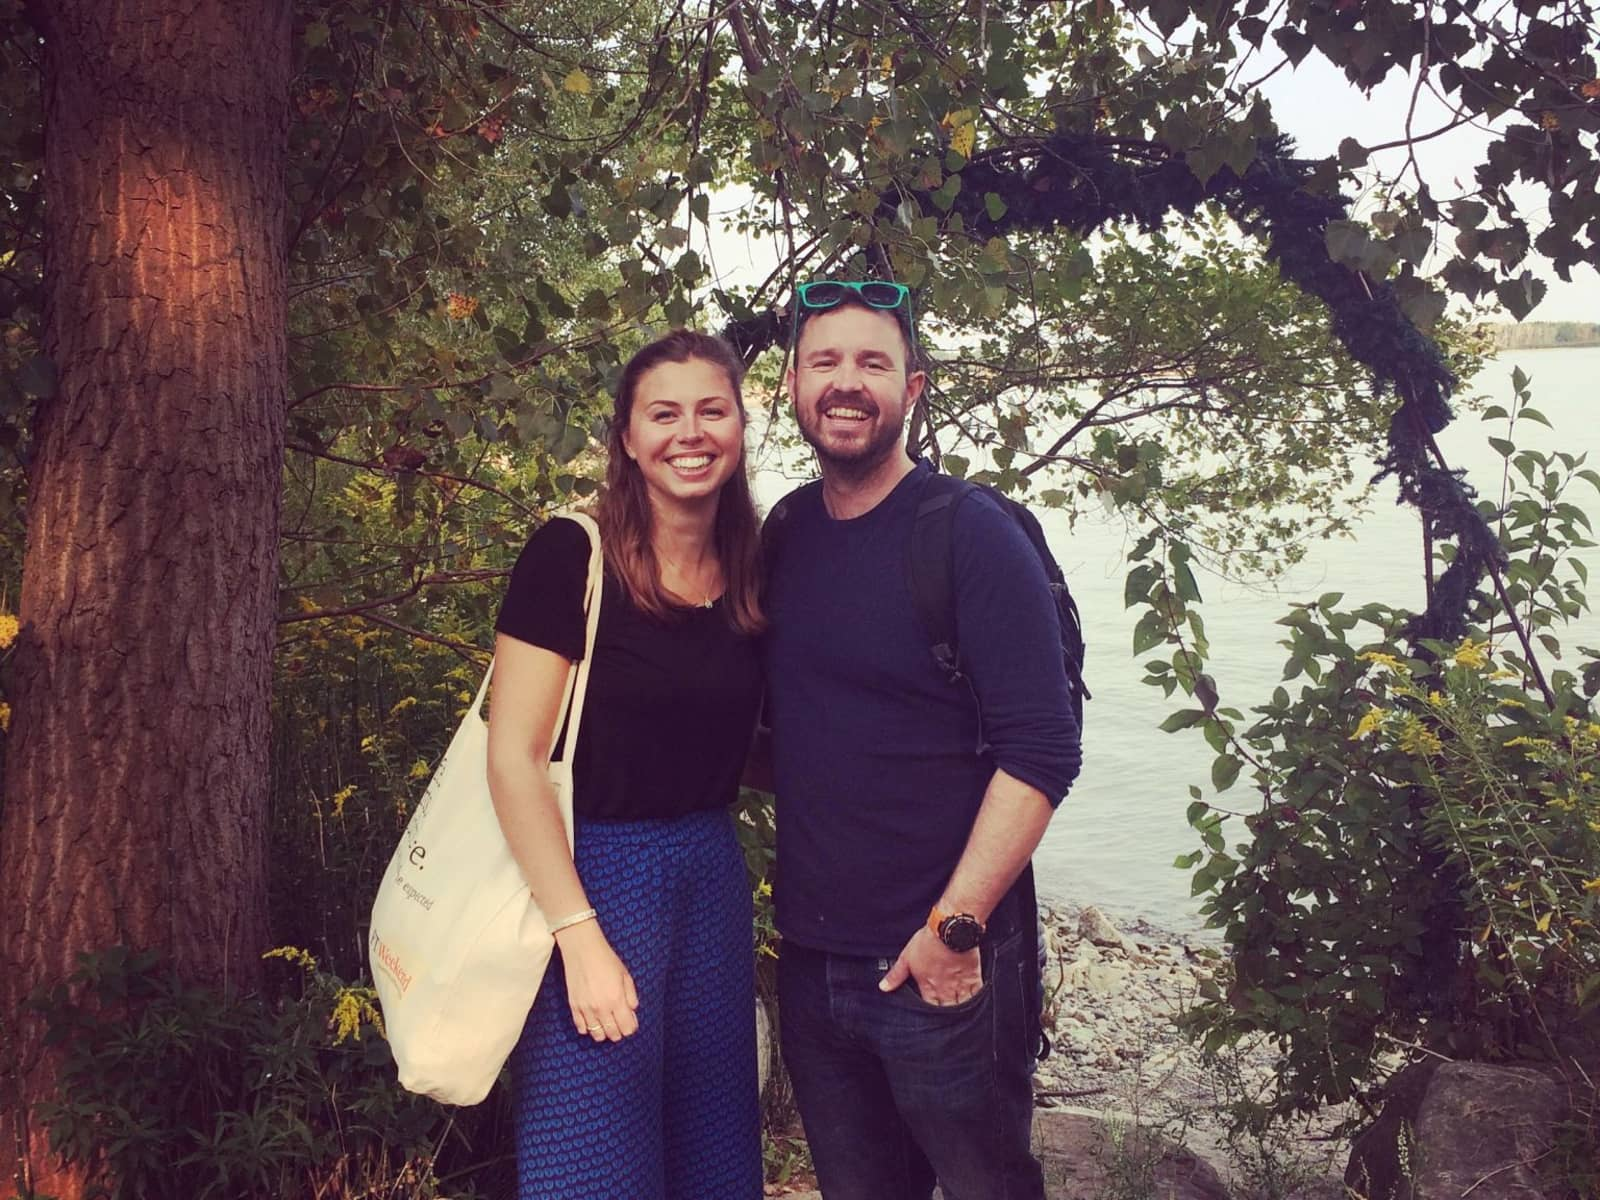 Rachel & Luke from Vancouver, British Columbia, Canada